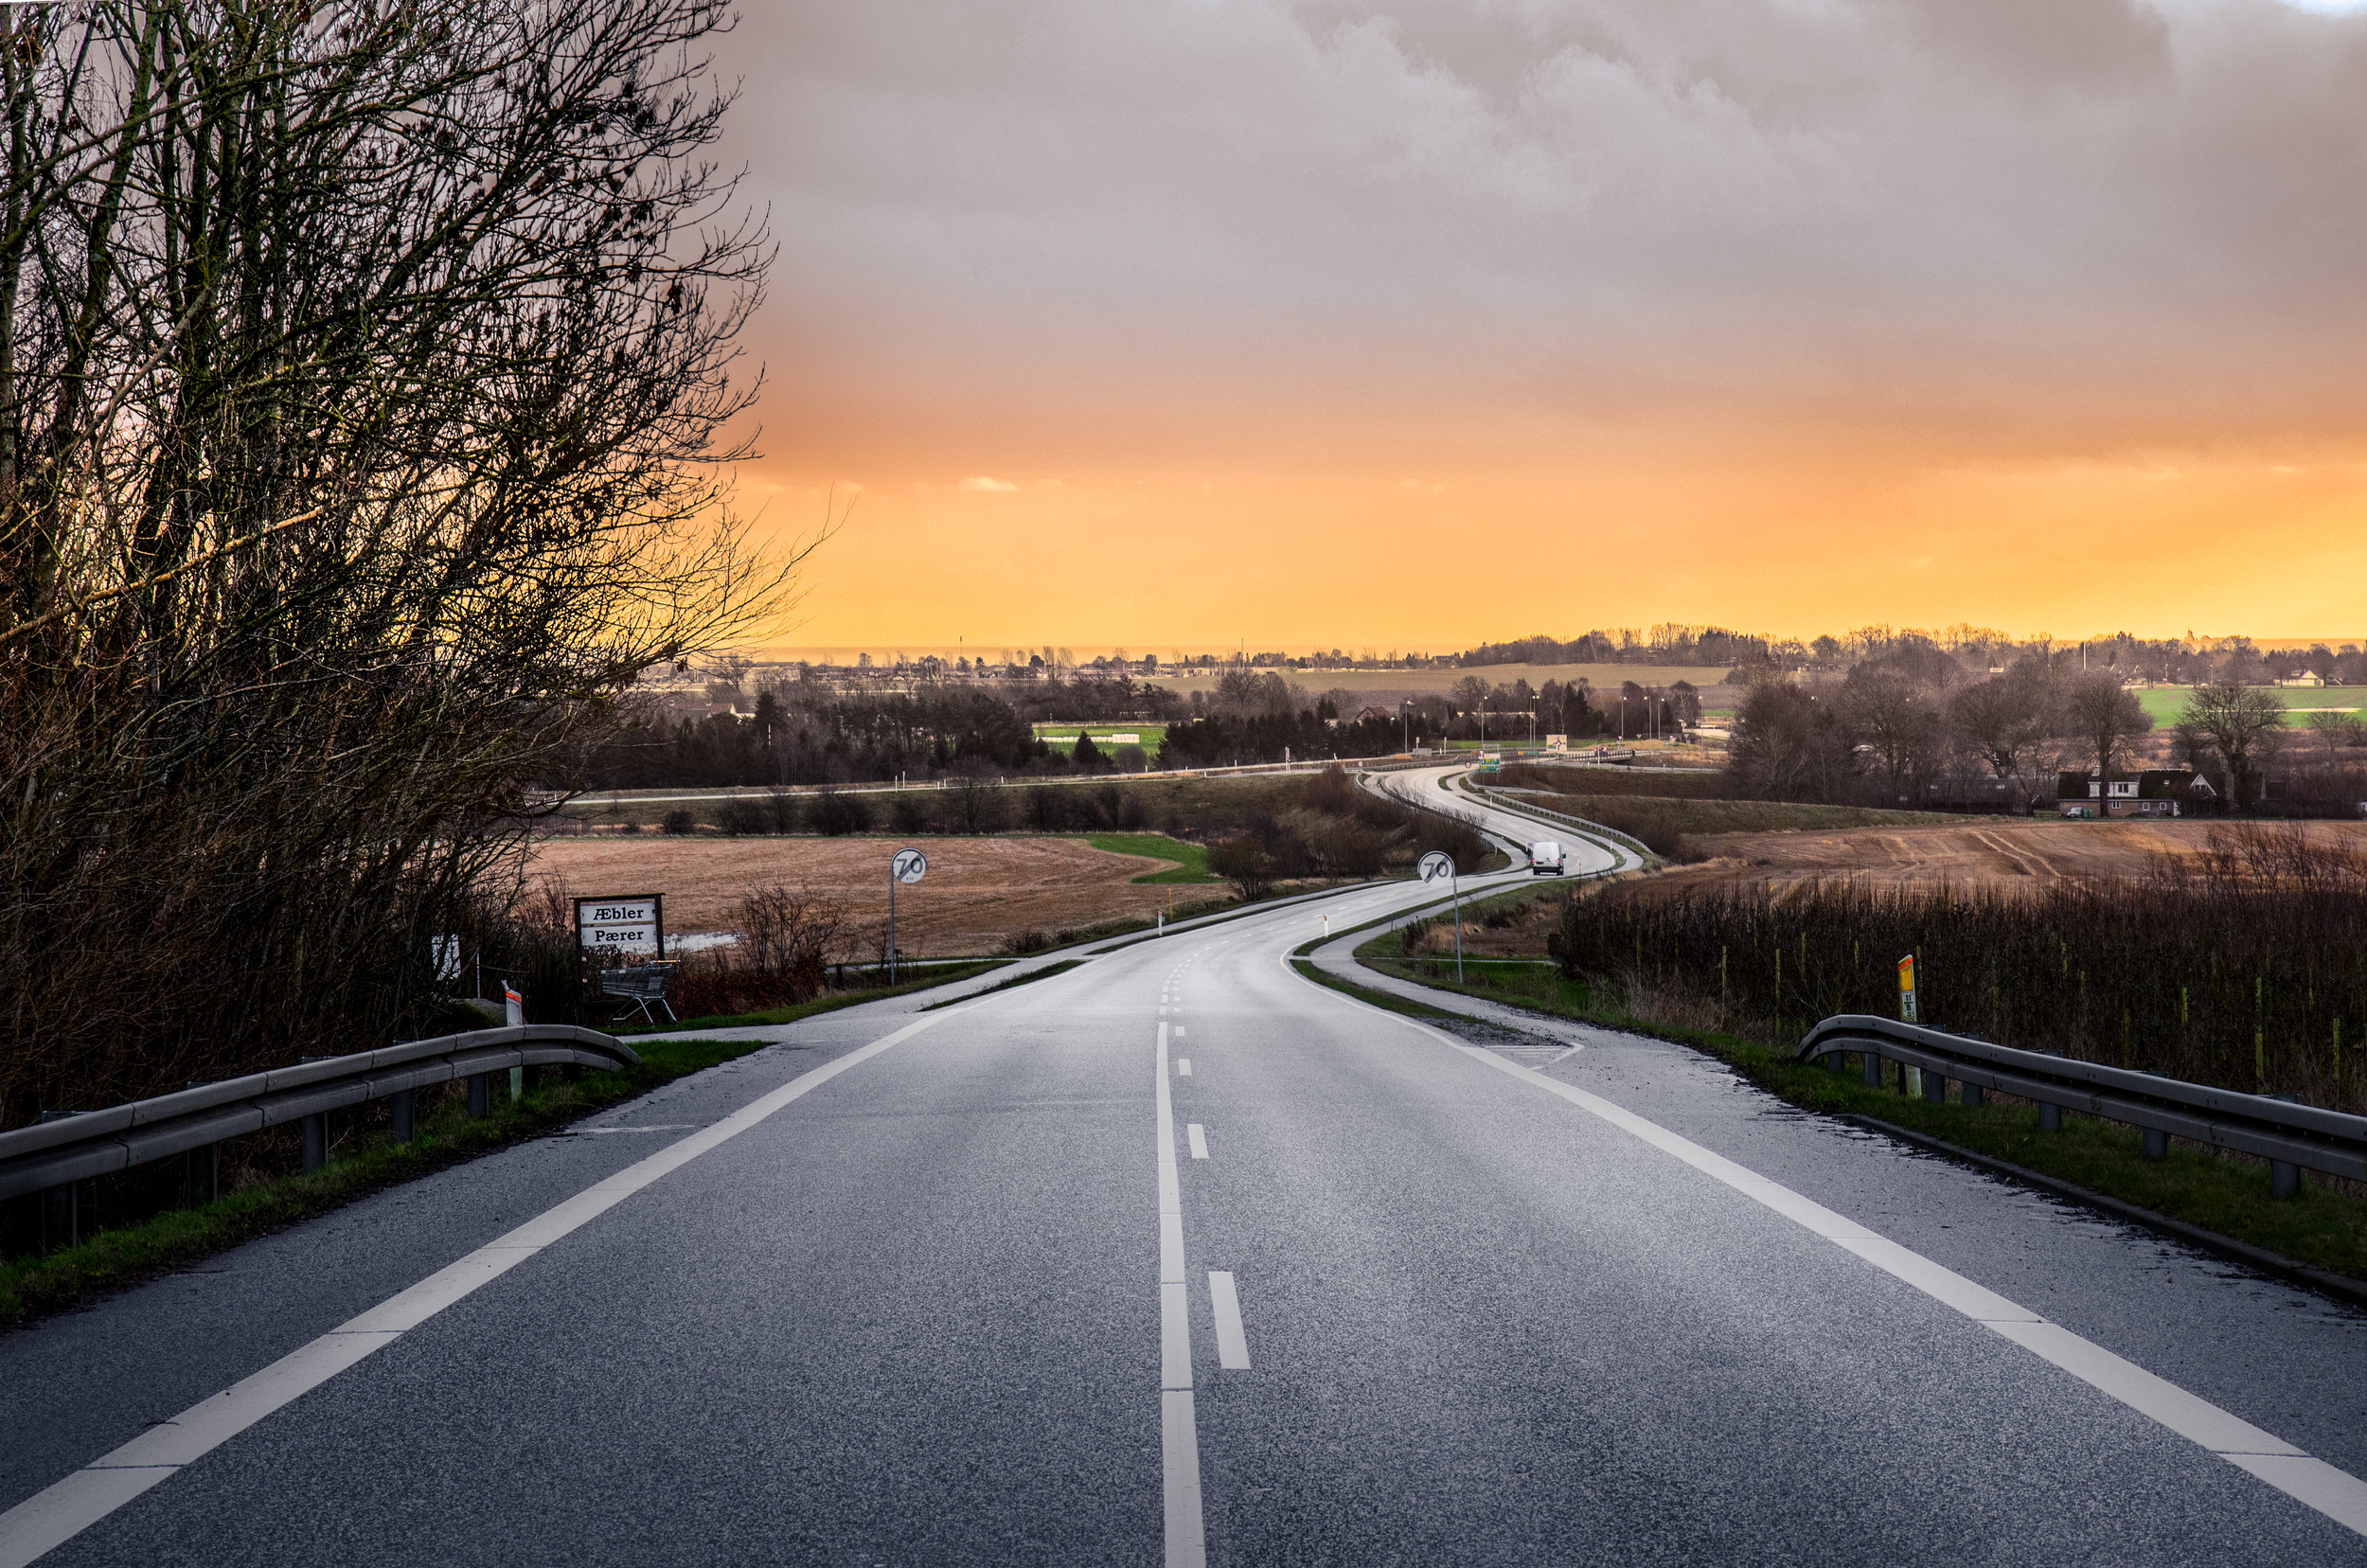 One of the roads leading towards Aarhus.